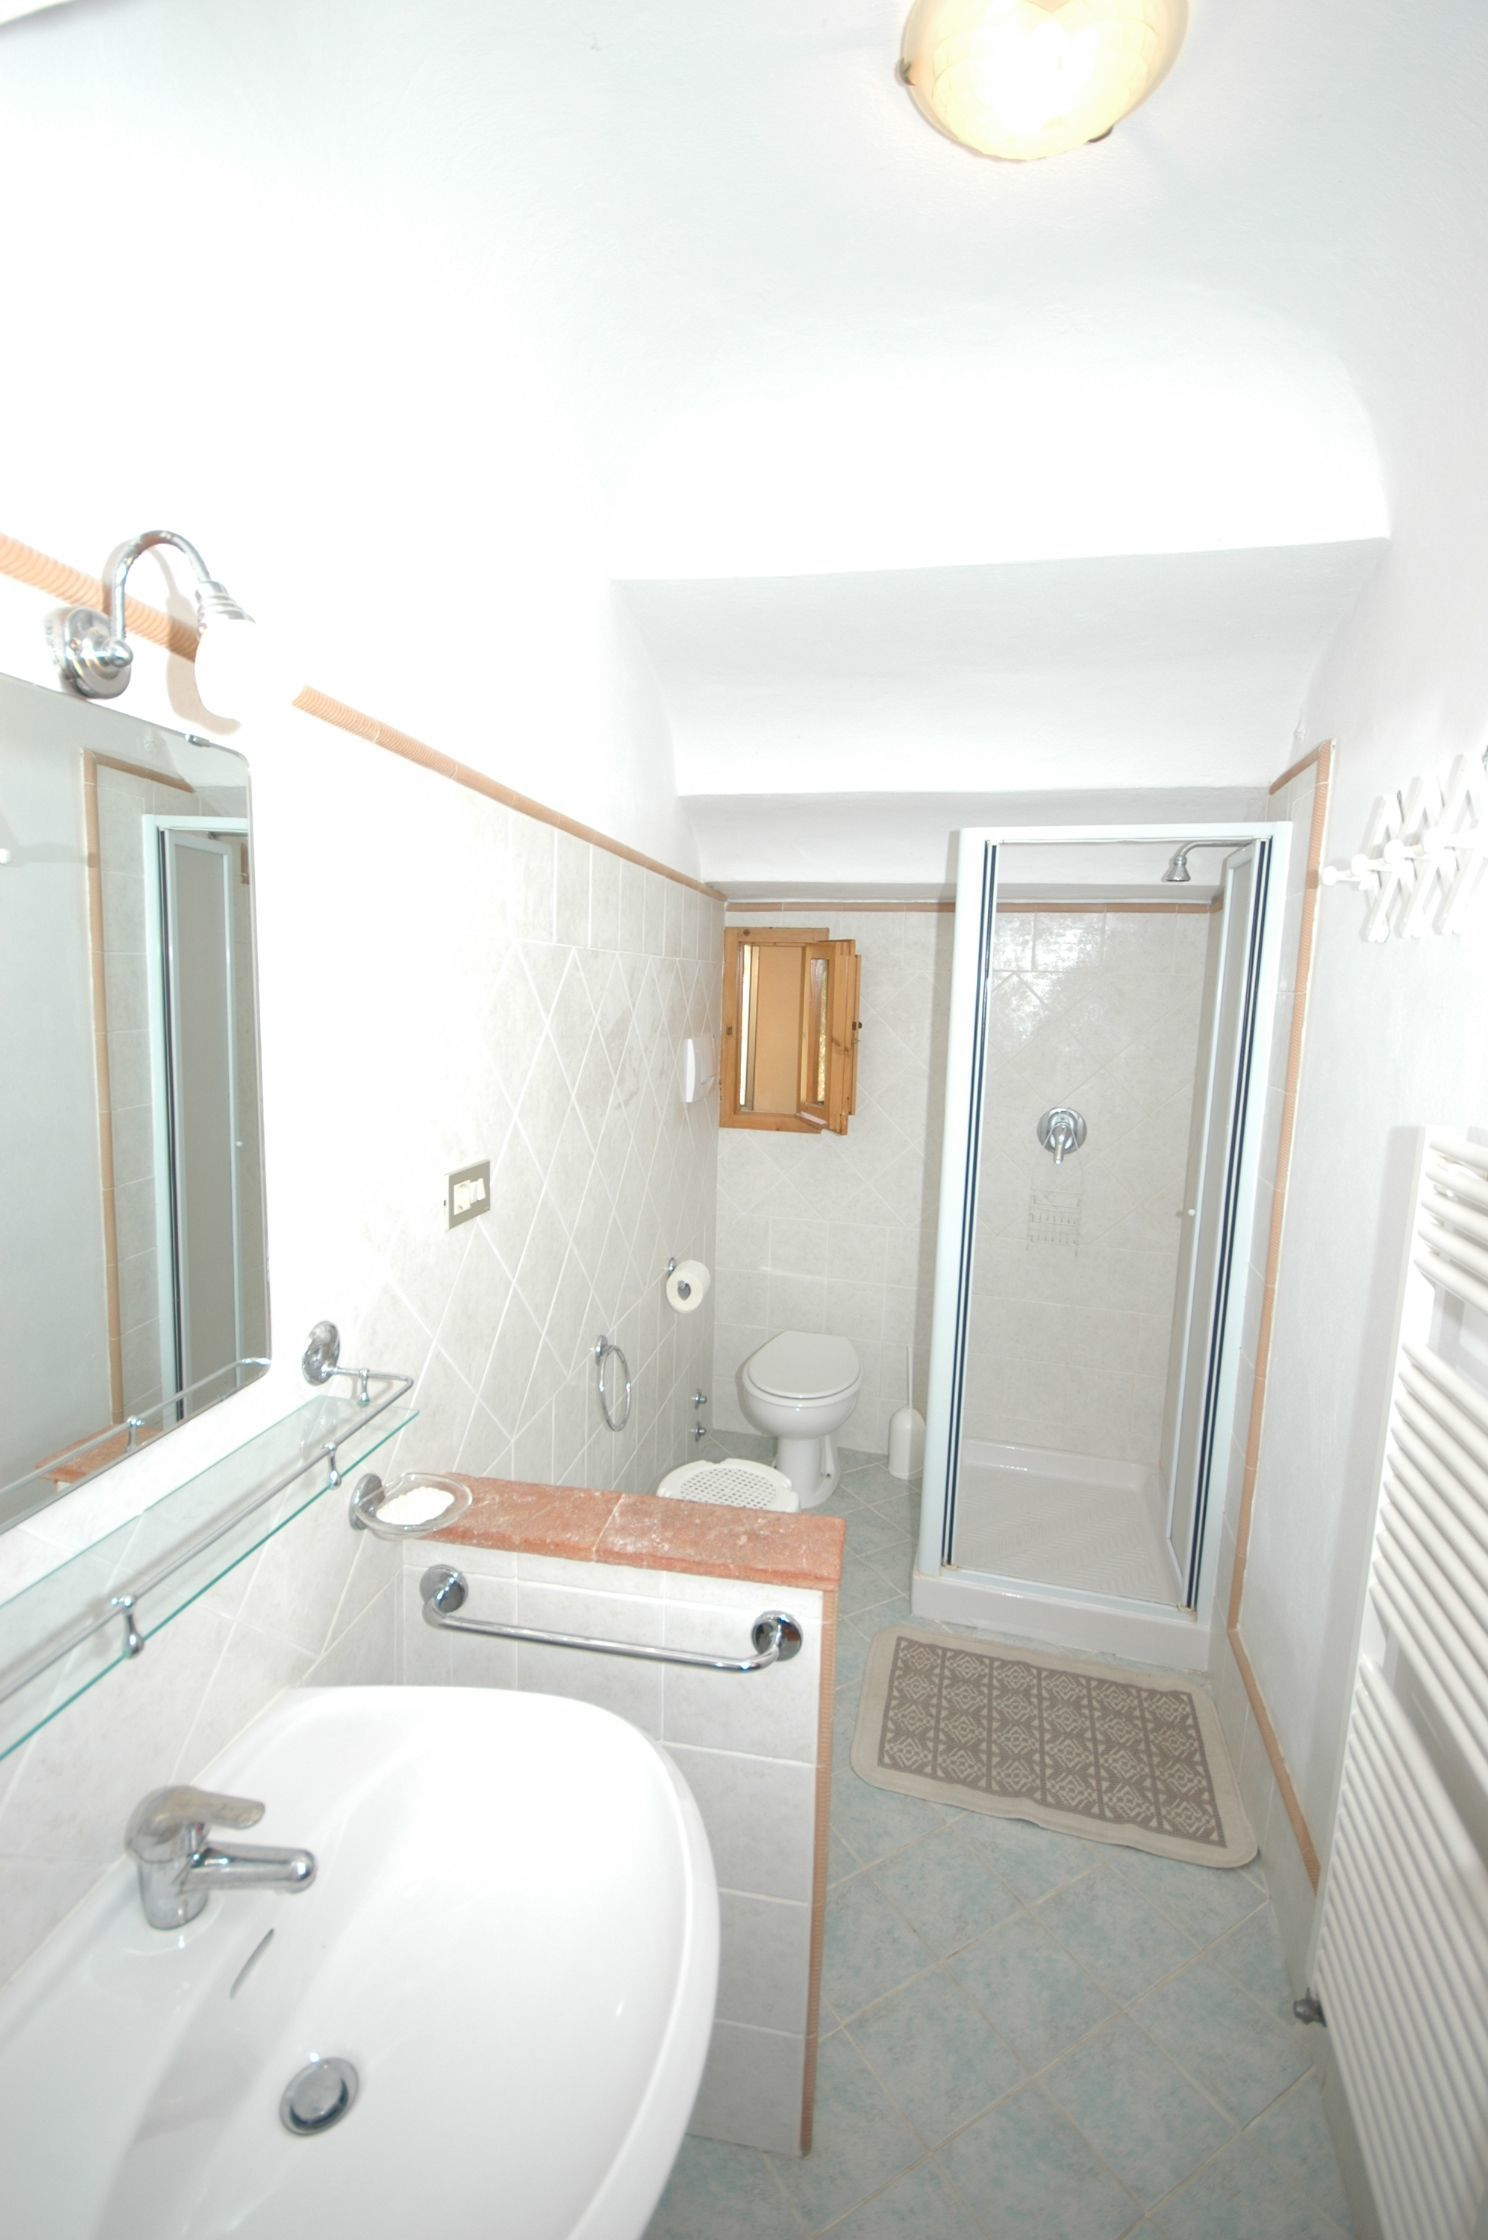 Immagini vasche vasca muse builtin jacuzzi with immagini - Vasche da bagno roma ...